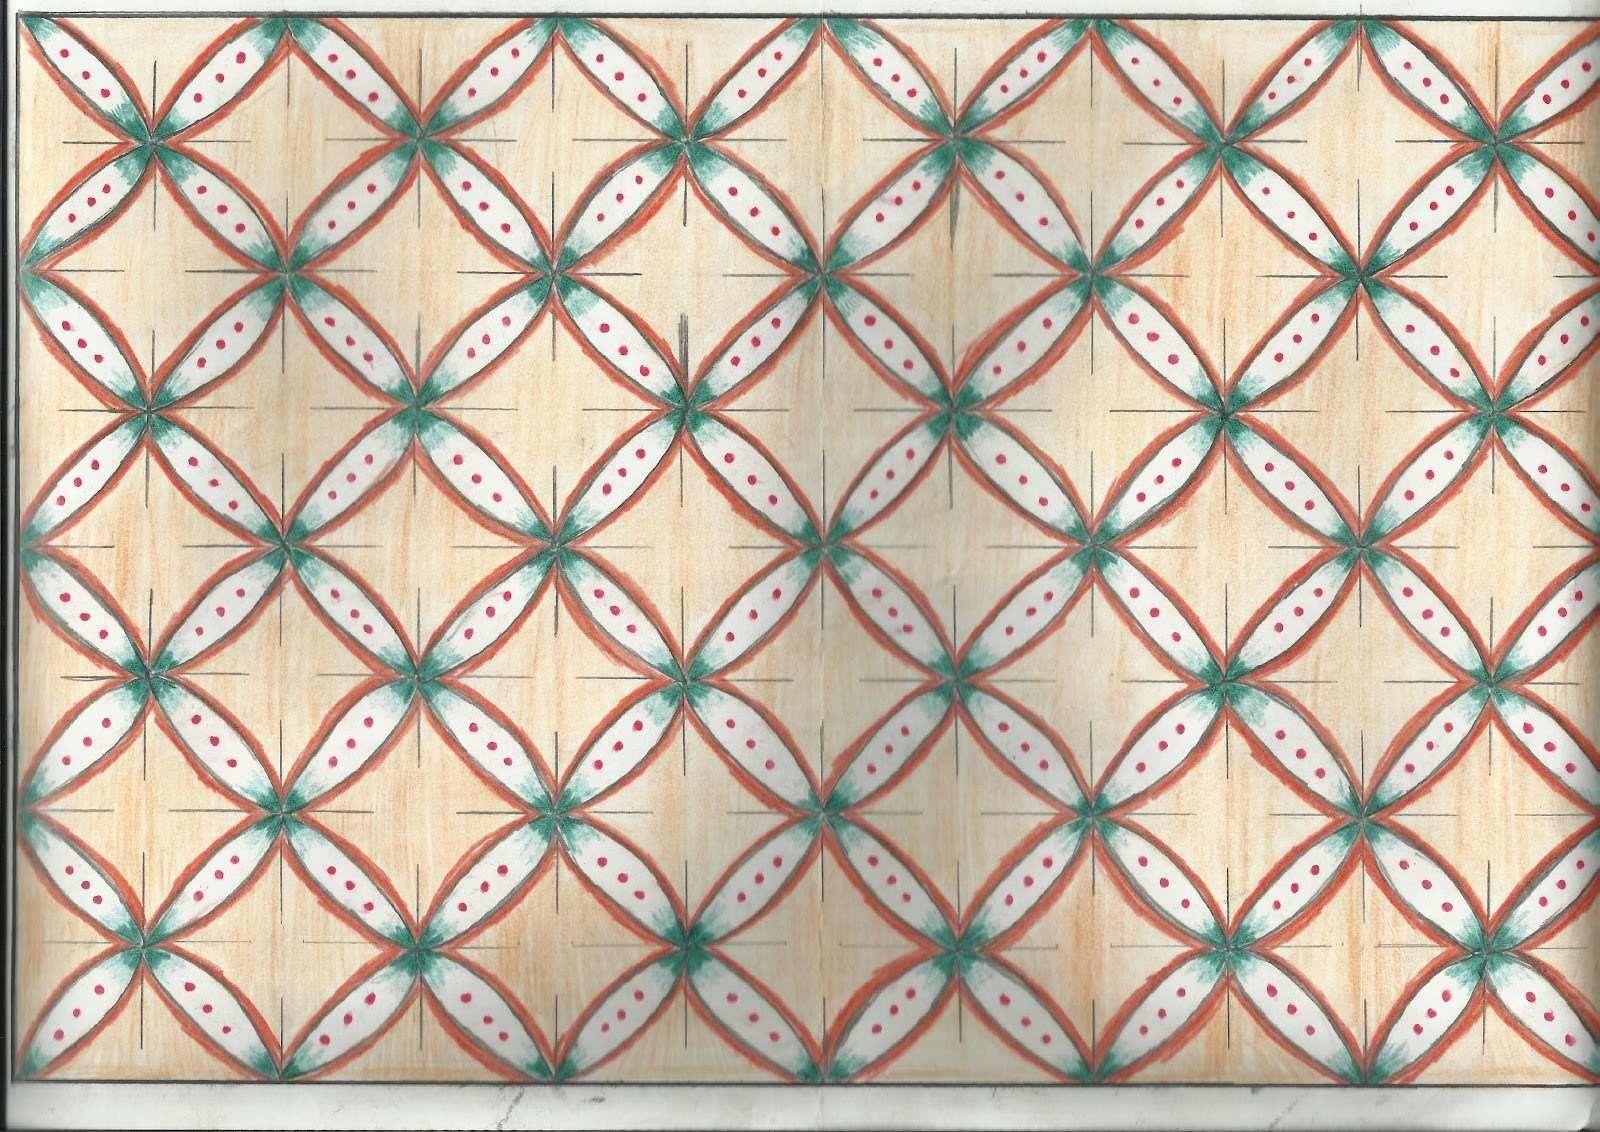 Motif Batik Bunga Dibuku Gambar Contoh Motif Batik Yang